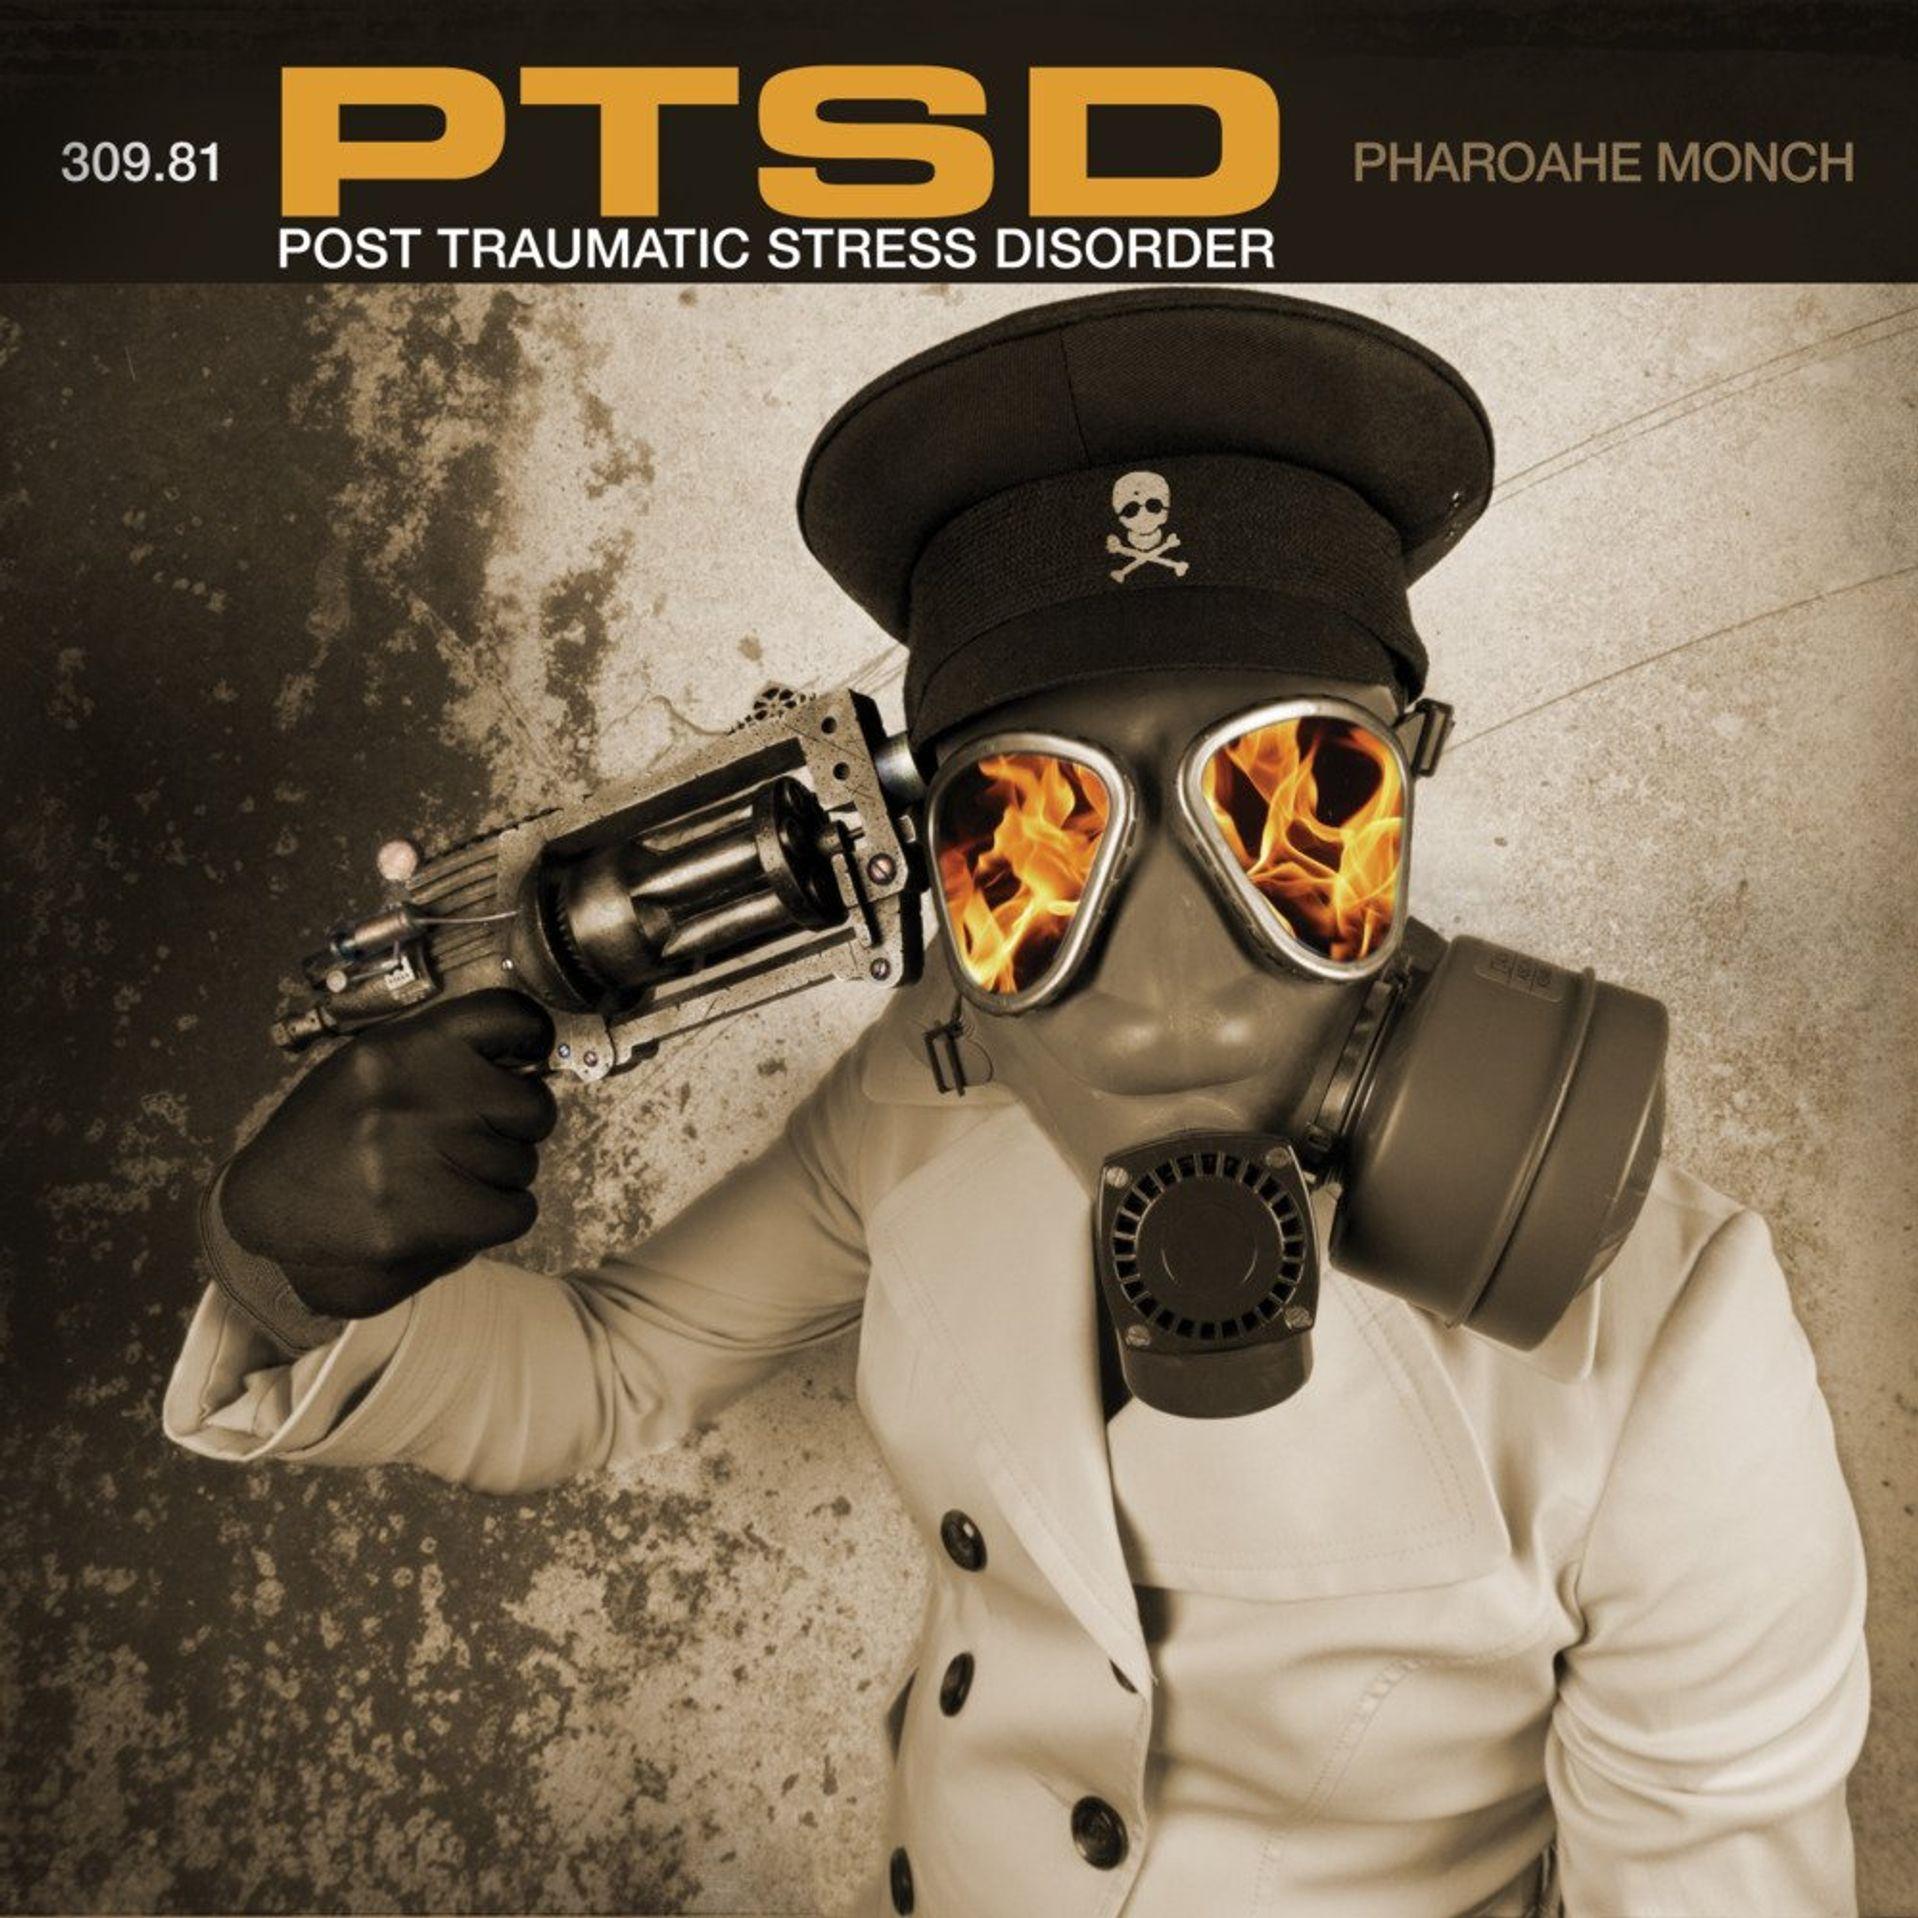 Album Title: PTSD: Post Traumatic Stress Disorder by: Pharoahe Monch